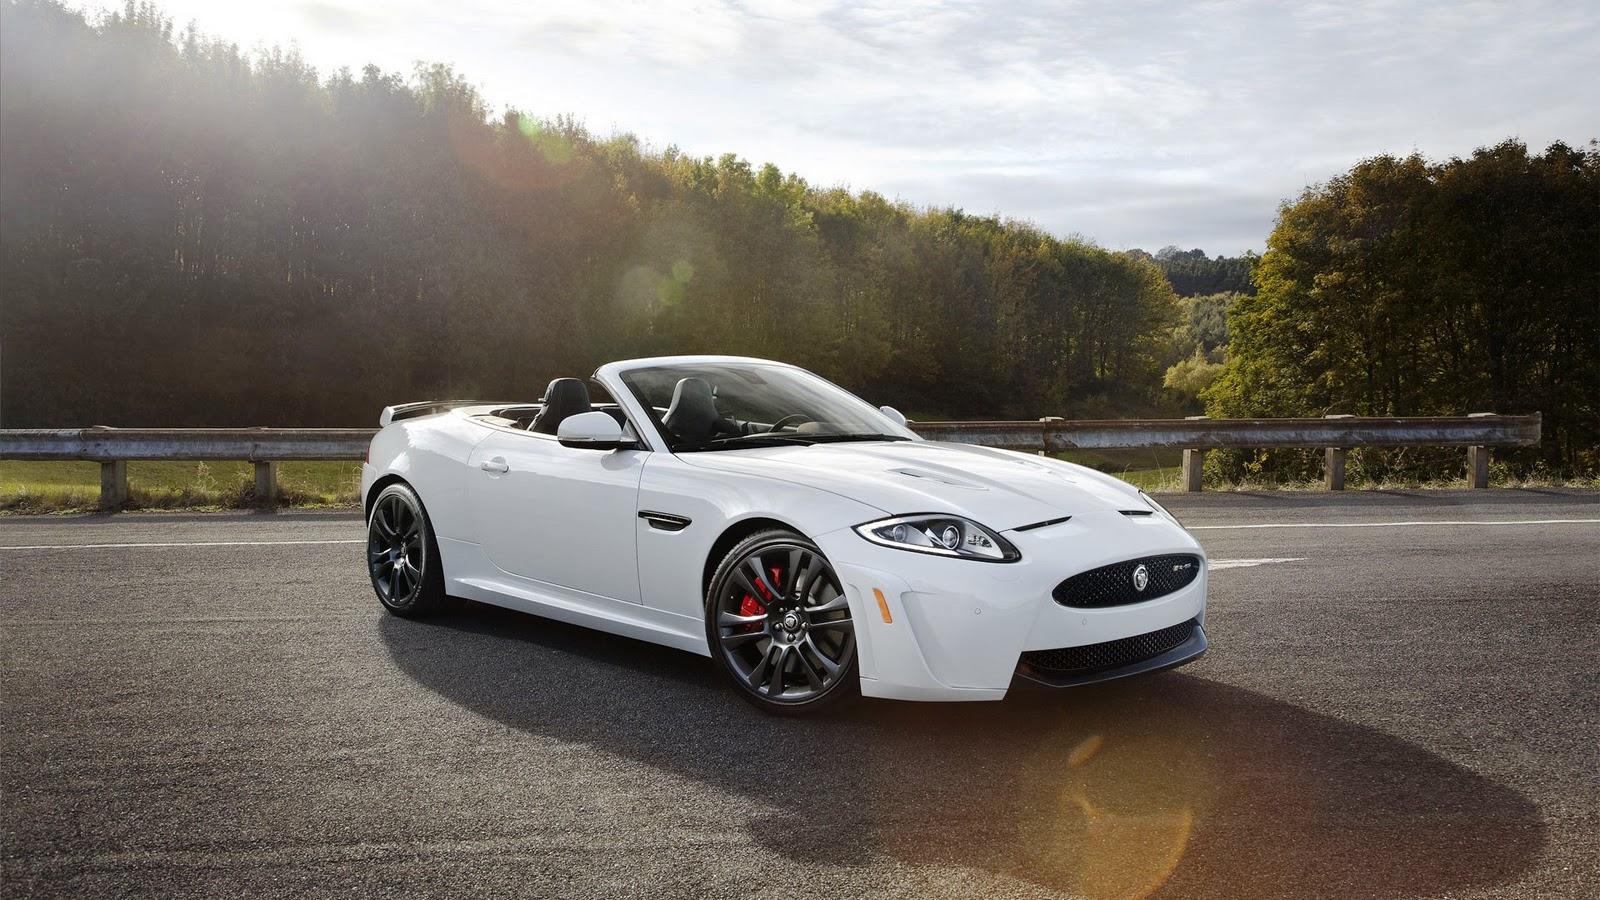 http://1.bp.blogspot.com/-wcnzXV_iOaM/TsjYJGX_RgI/AAAAAAAAAe8/owf4kMQhzHY/s1600/2013+Jaguar+C-X16+19.jpg